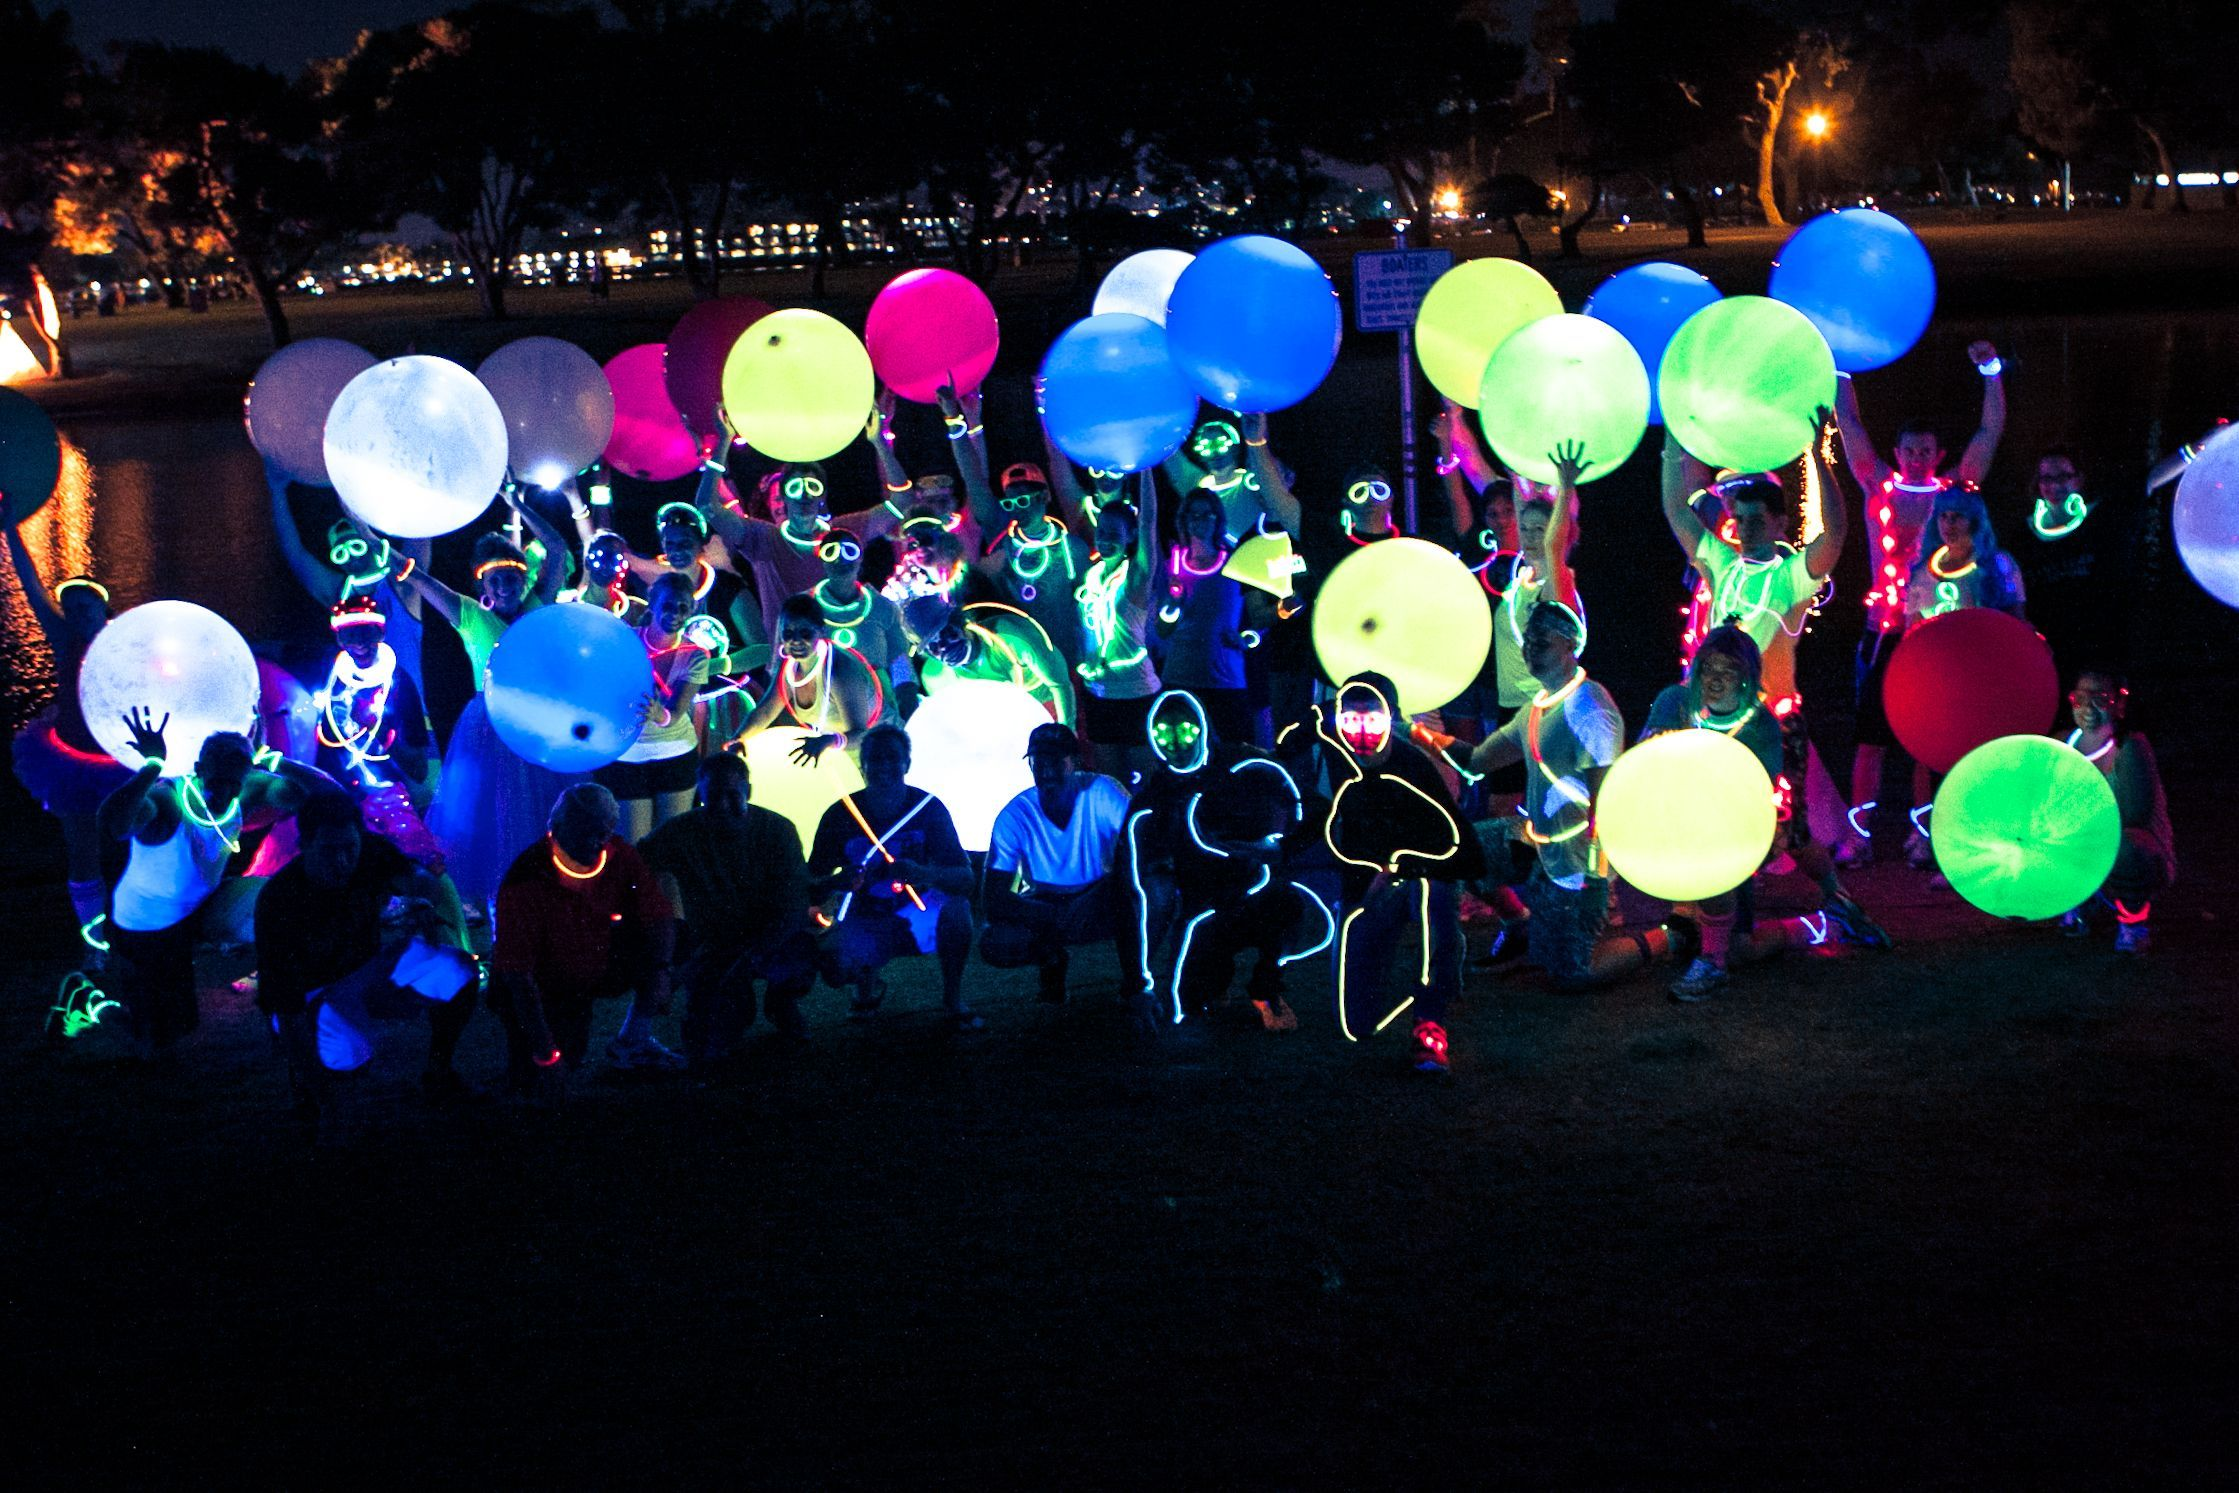 Electric Run Celebration Electric Run Glow Run Creative Event